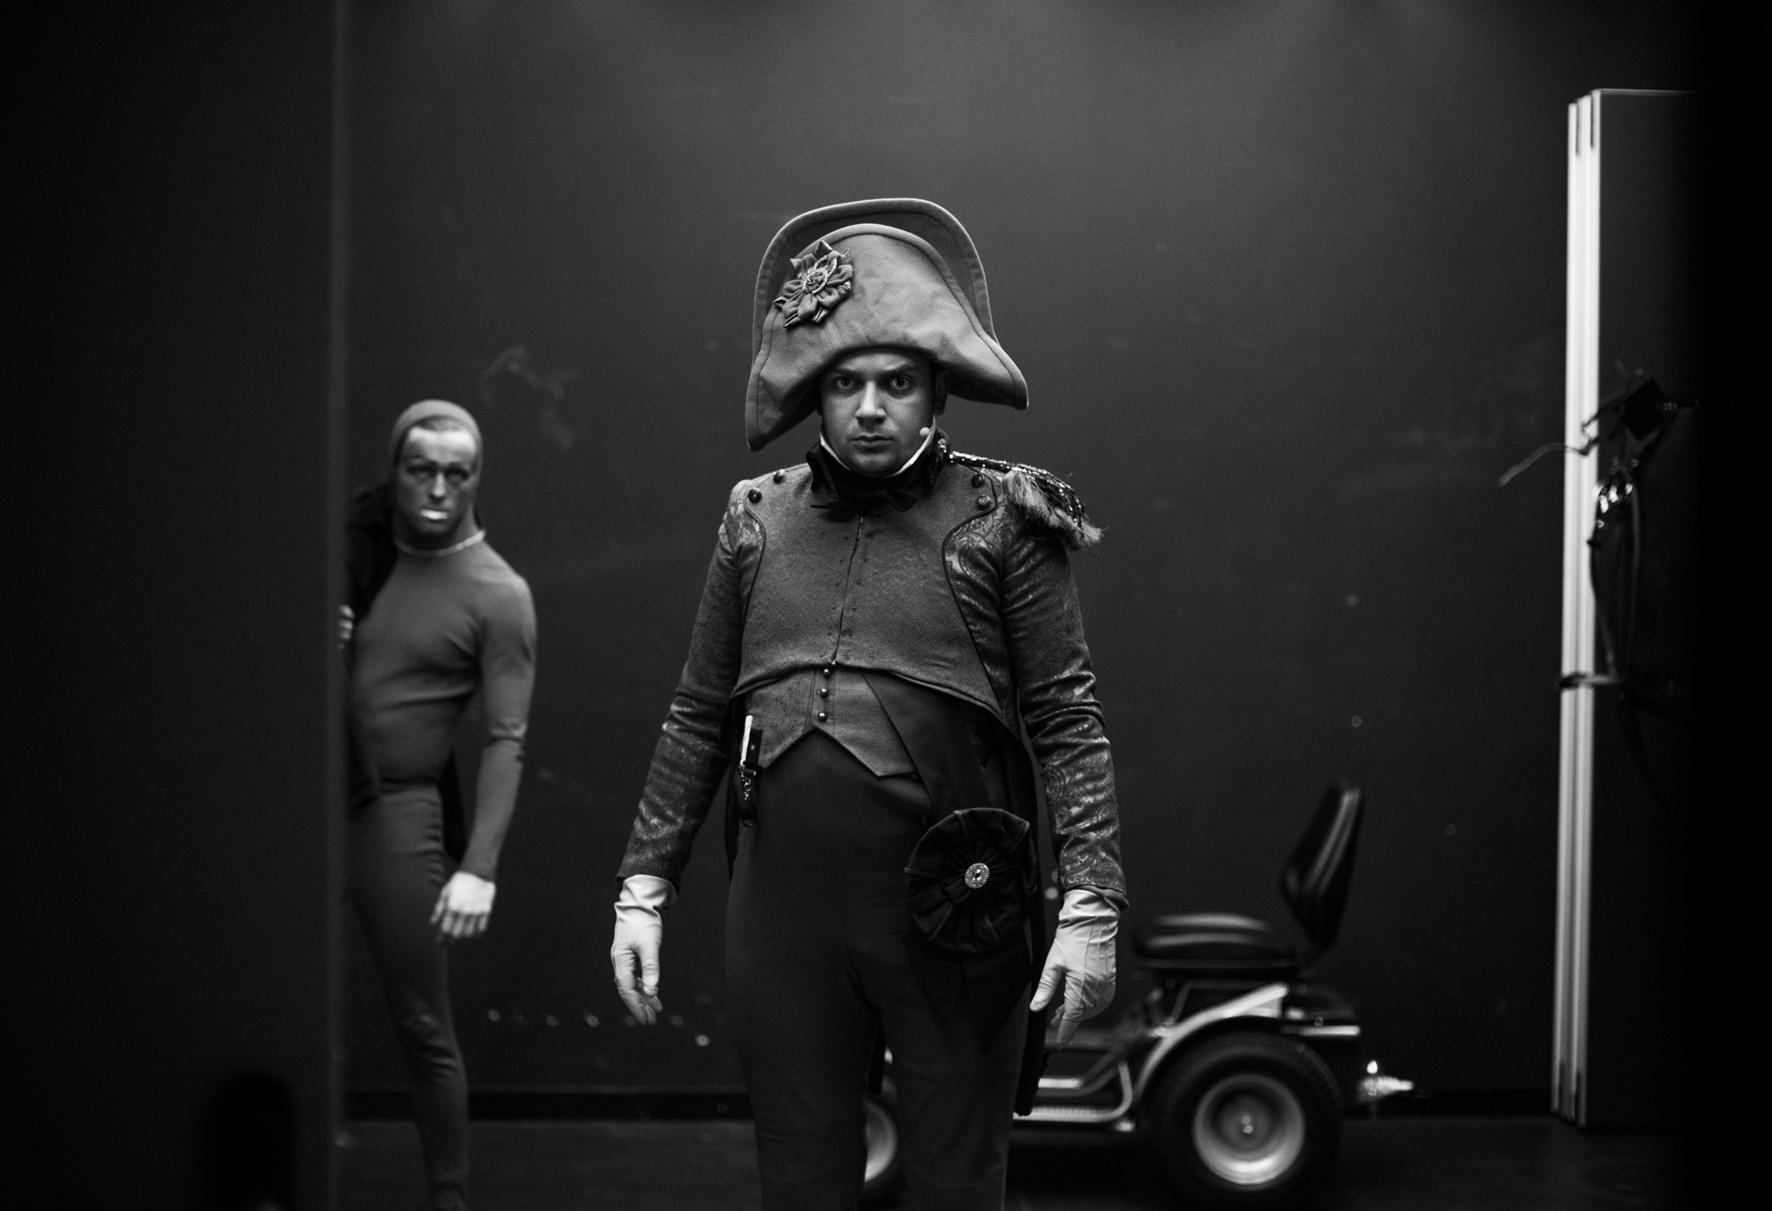 Олимпия Орлова. Backstage. Взгляд из-за кулис смотреть фото